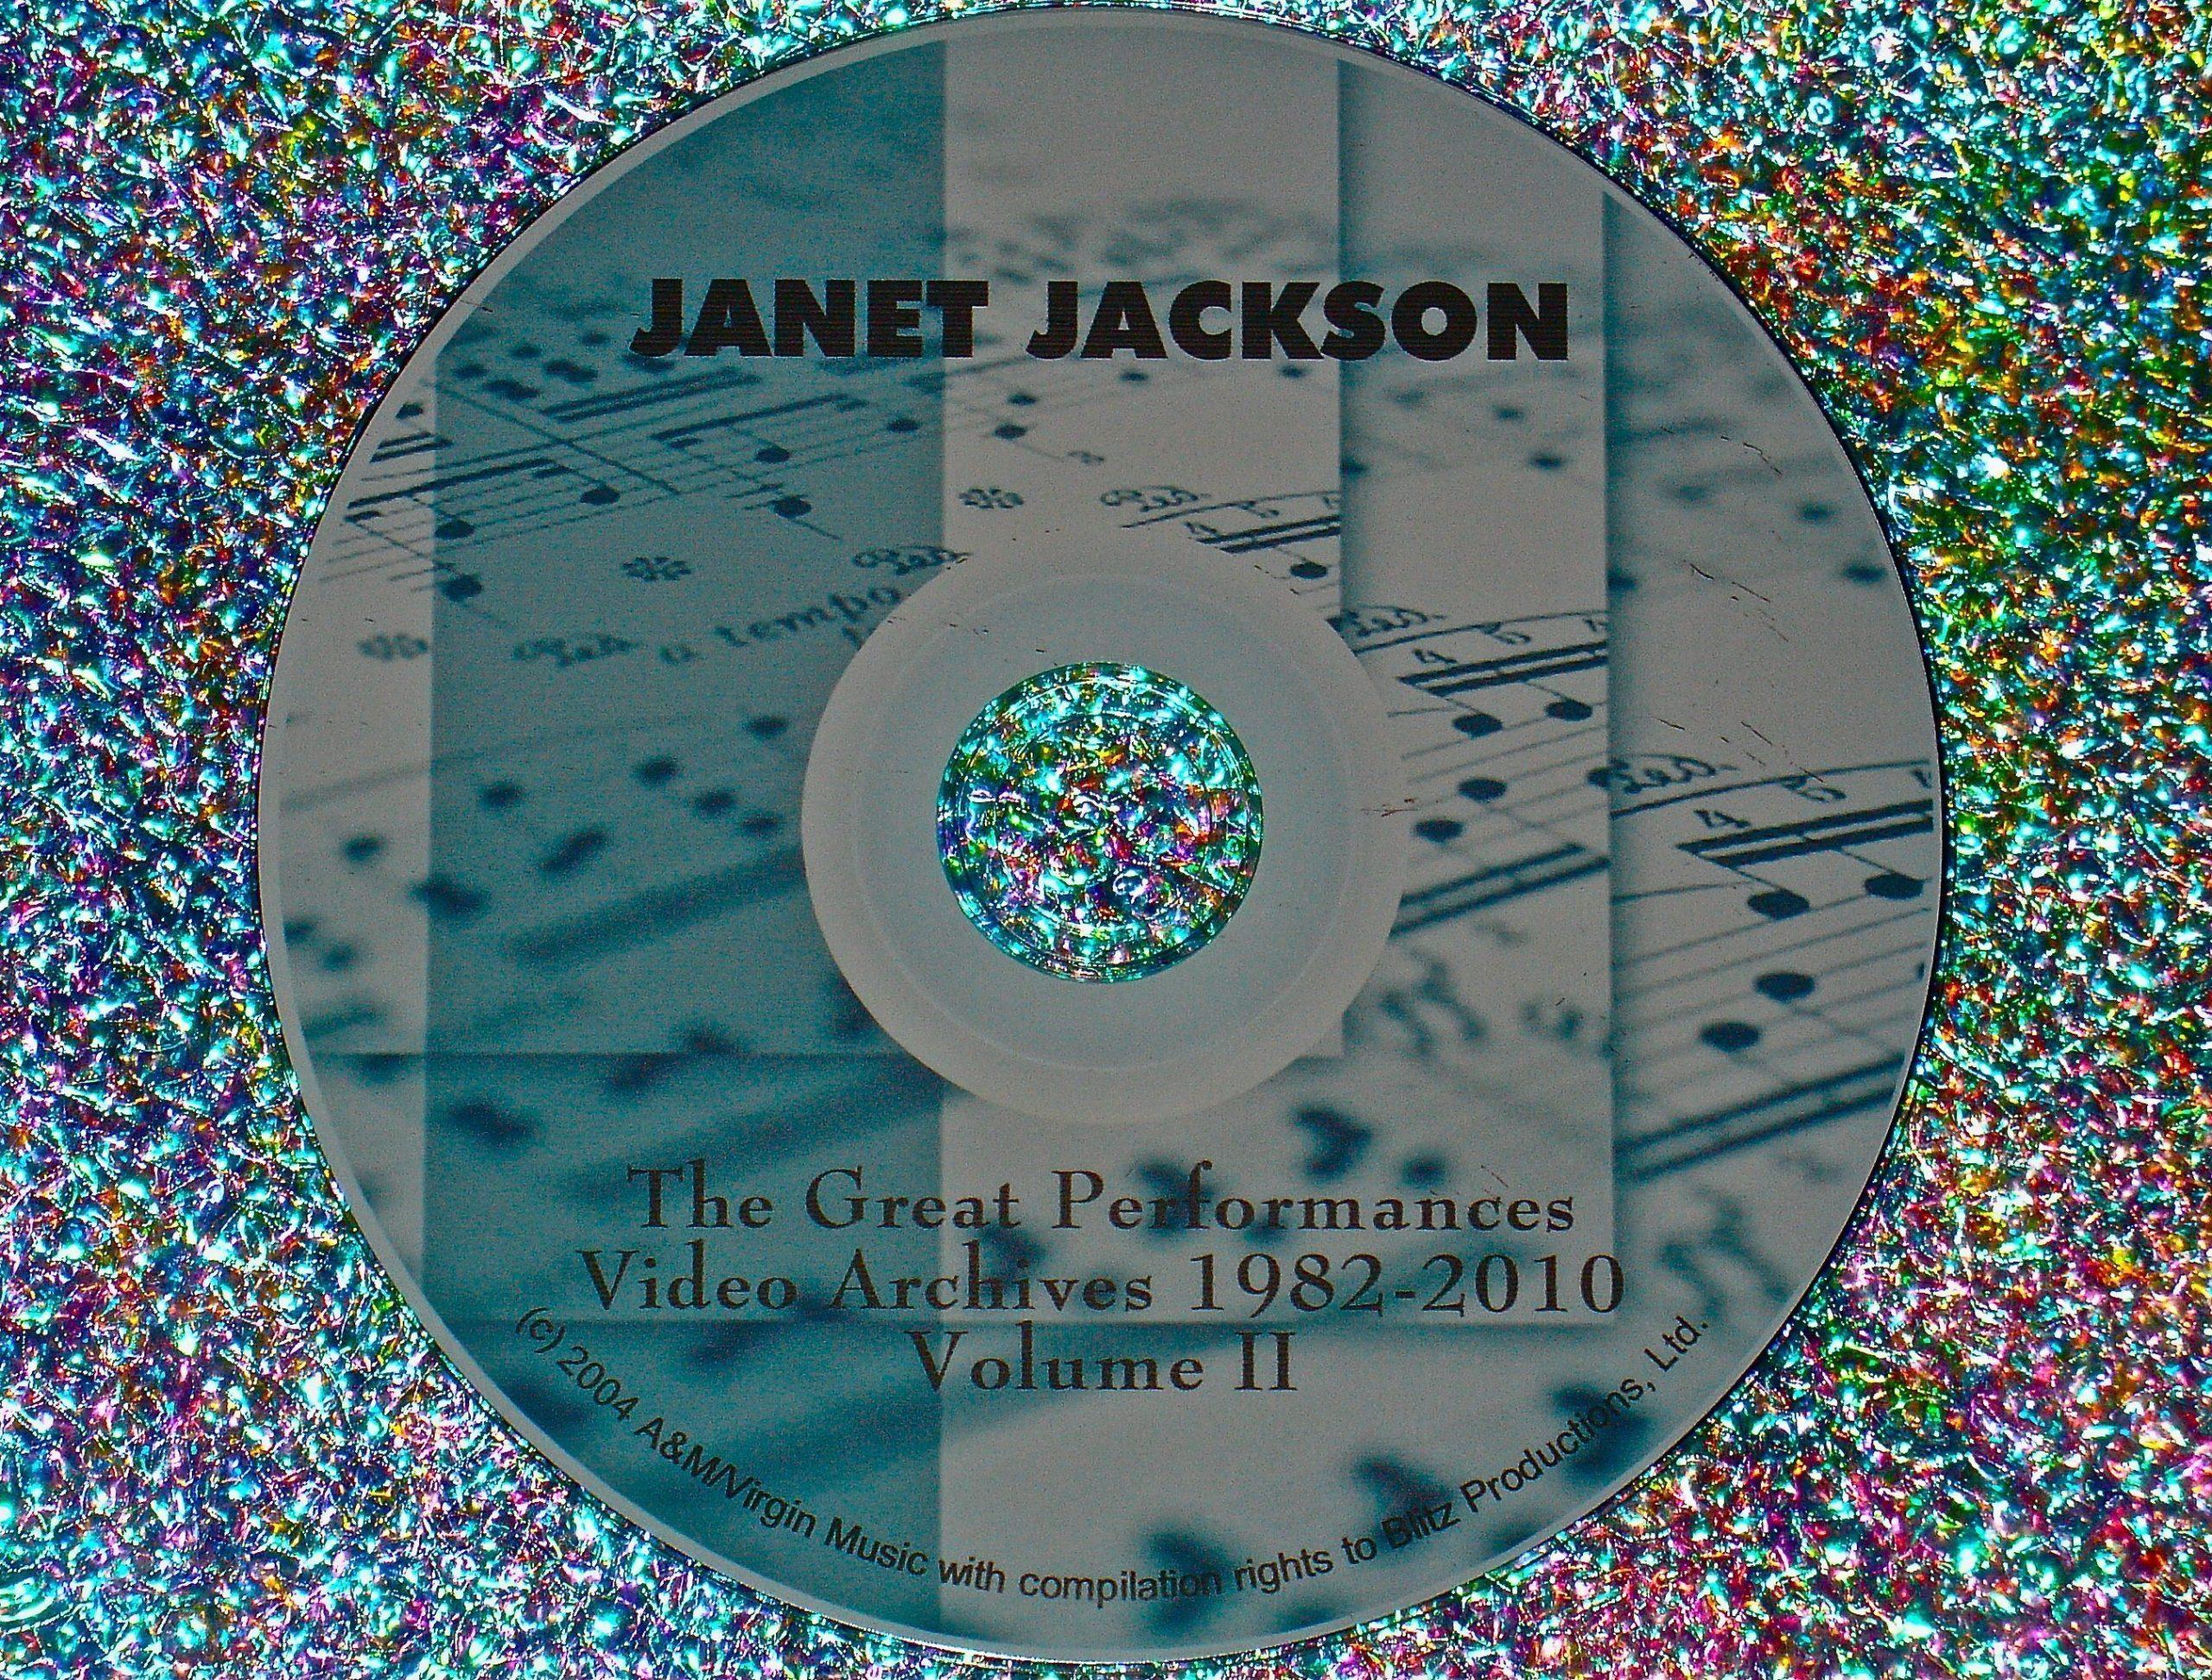 Janet Jackson Greatest Performances Video Archives 1982-2010 Volume II (2 Hrs.)